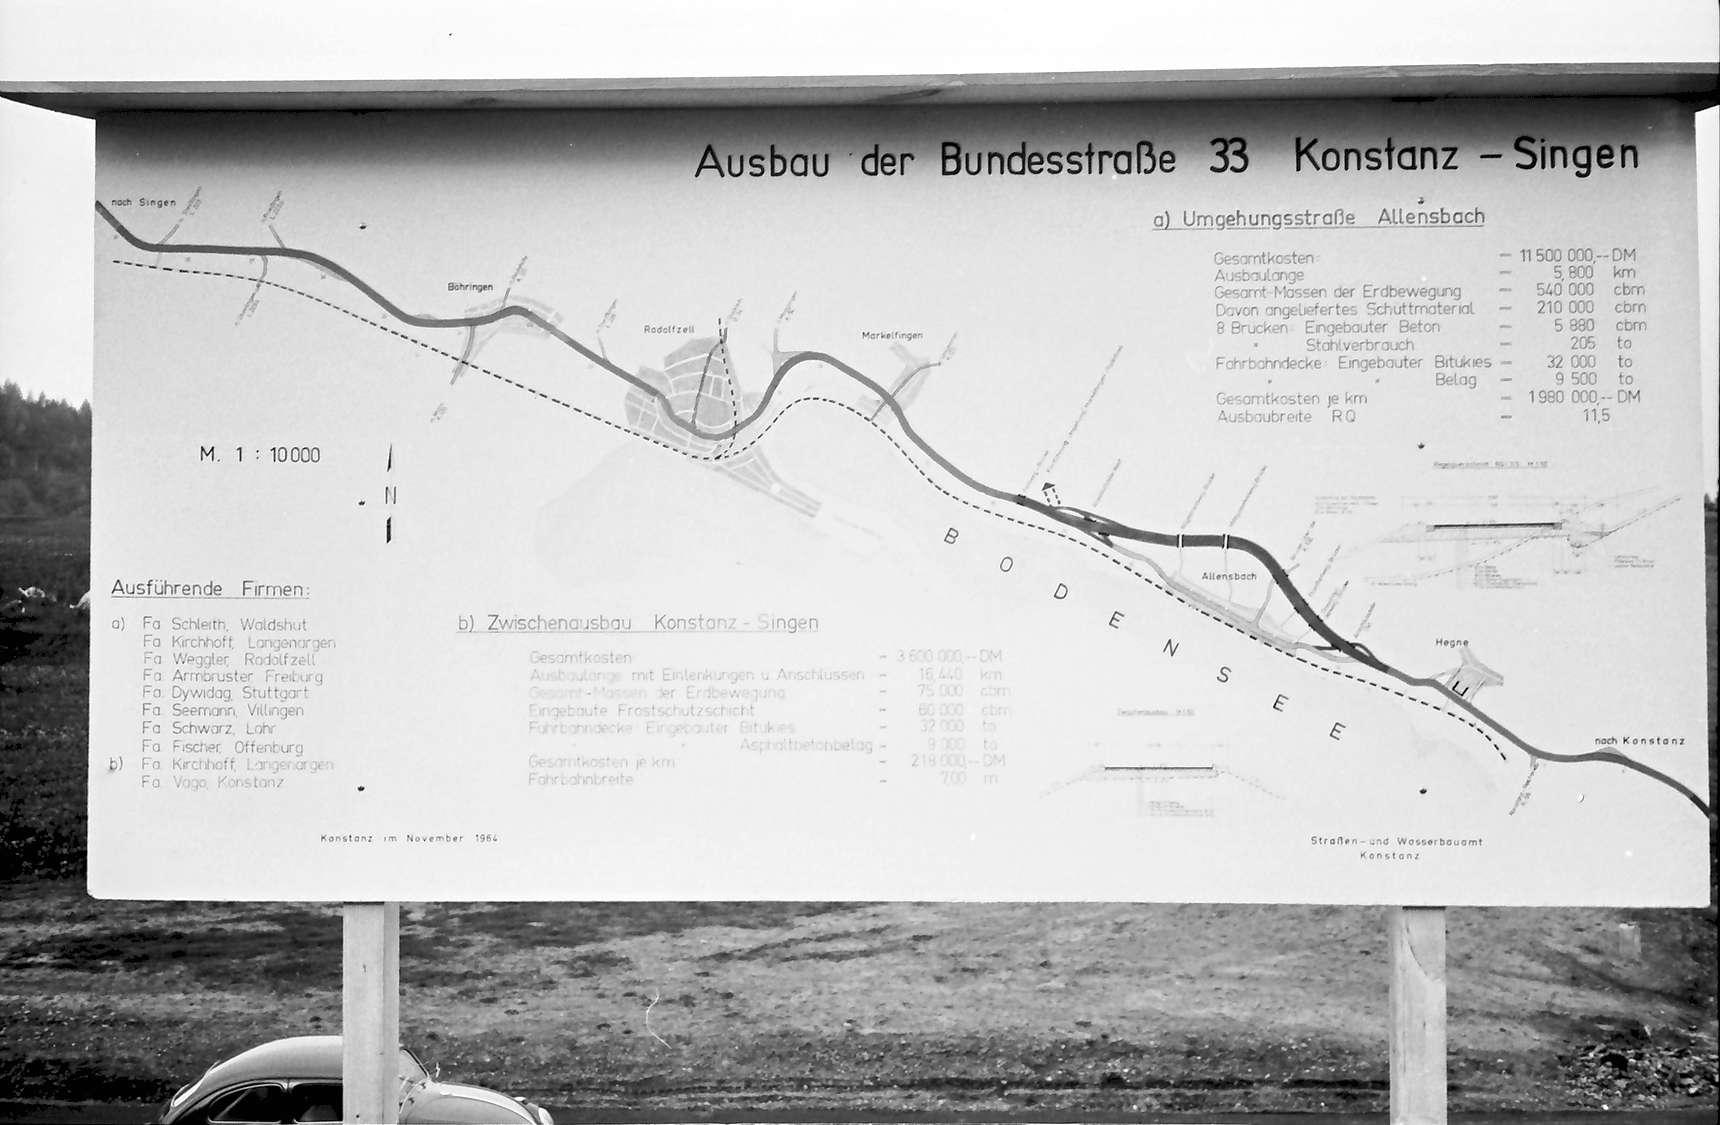 Allensbach: Umgehungsstraße, Plan, Bild 1